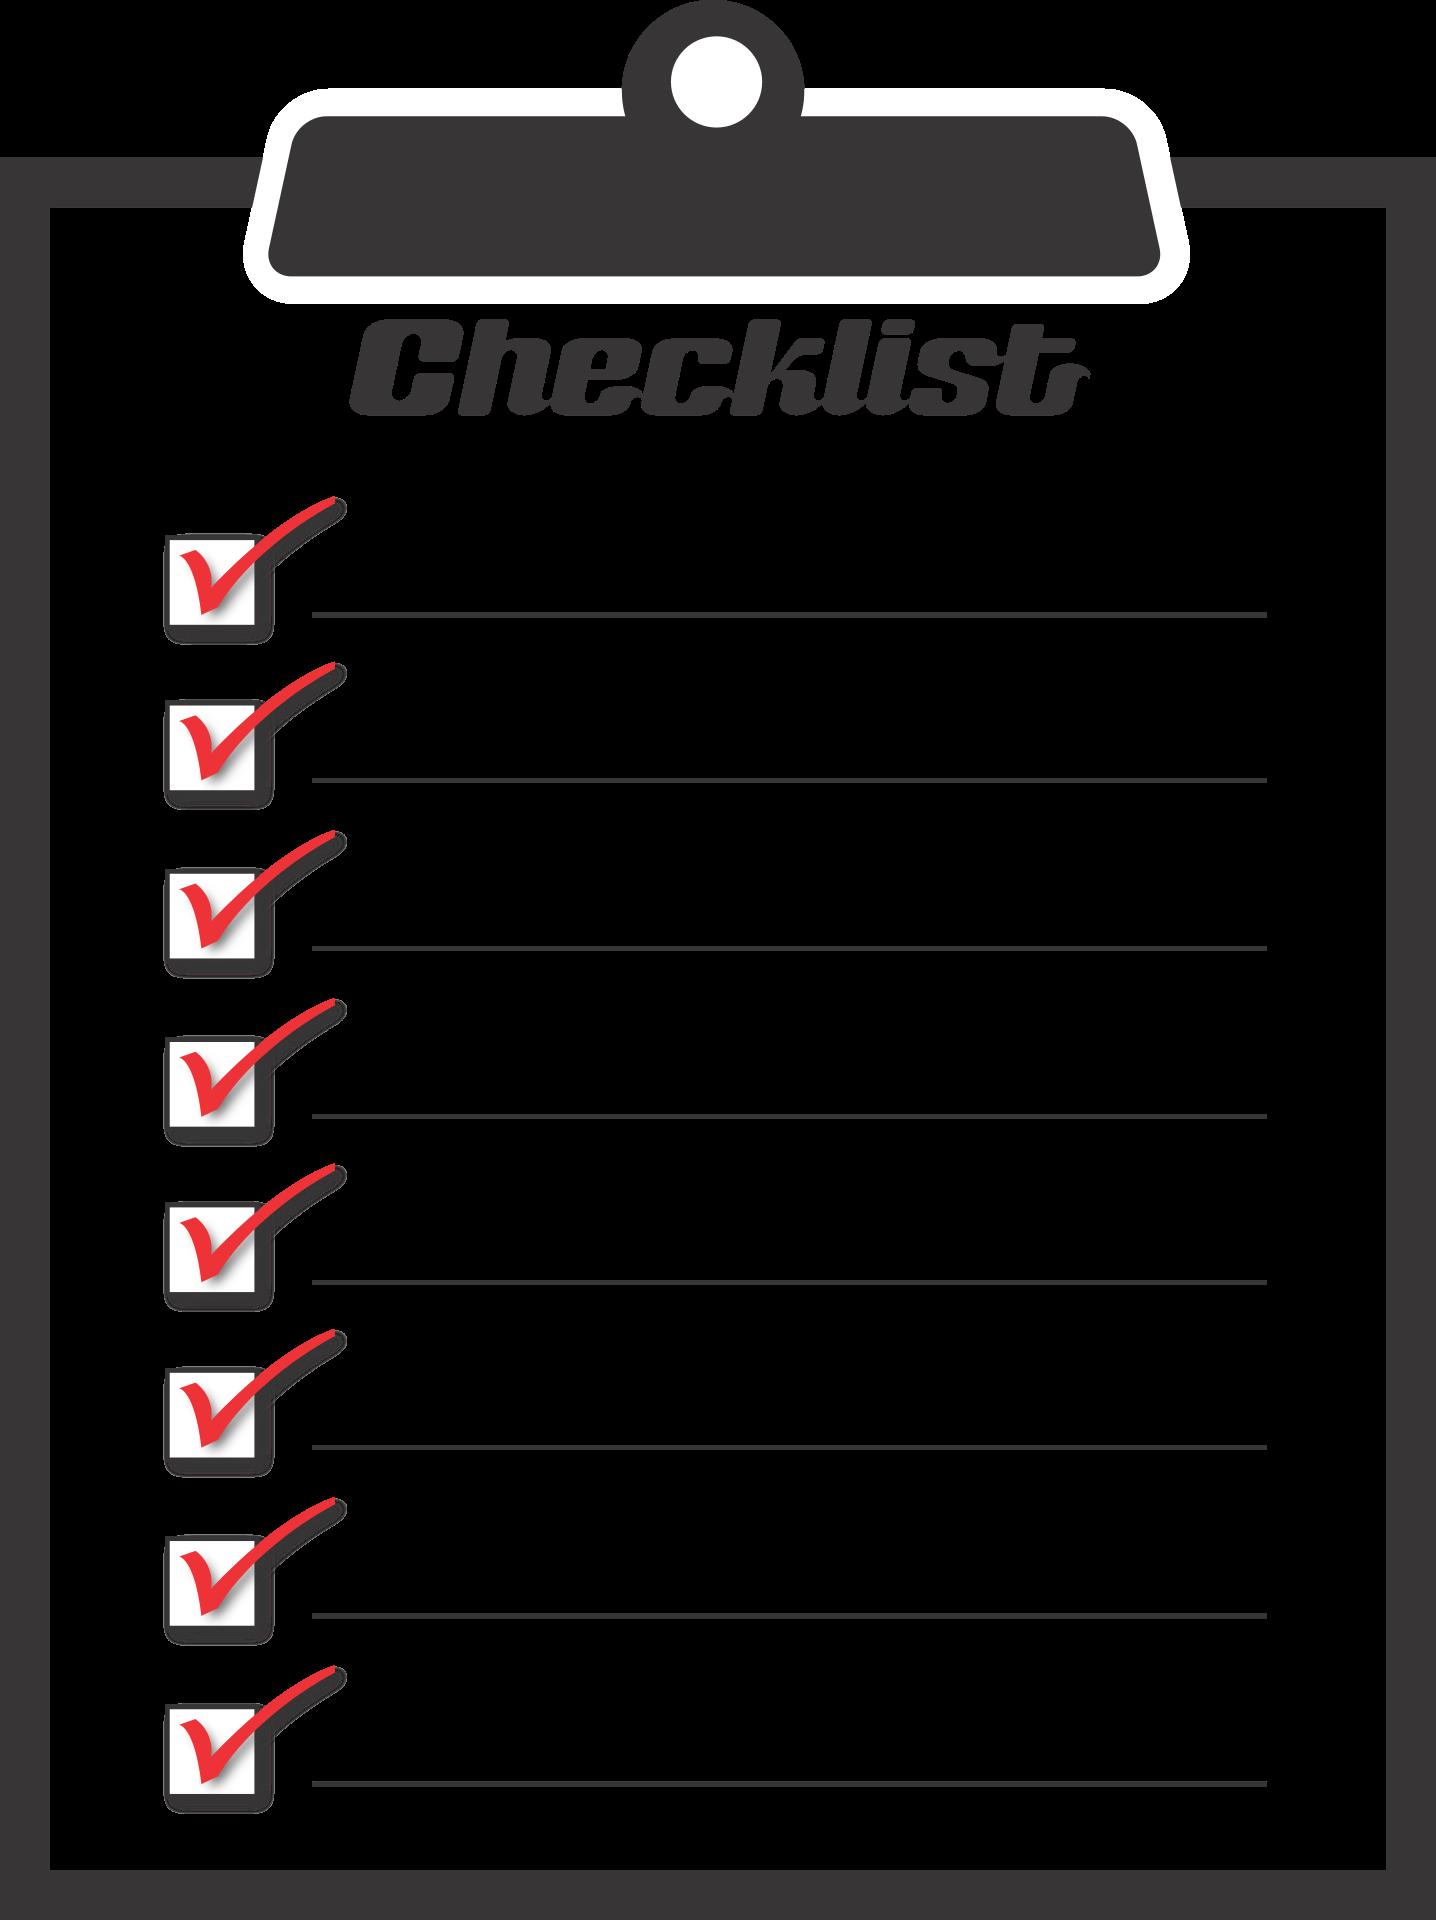 checklist-1316848.png